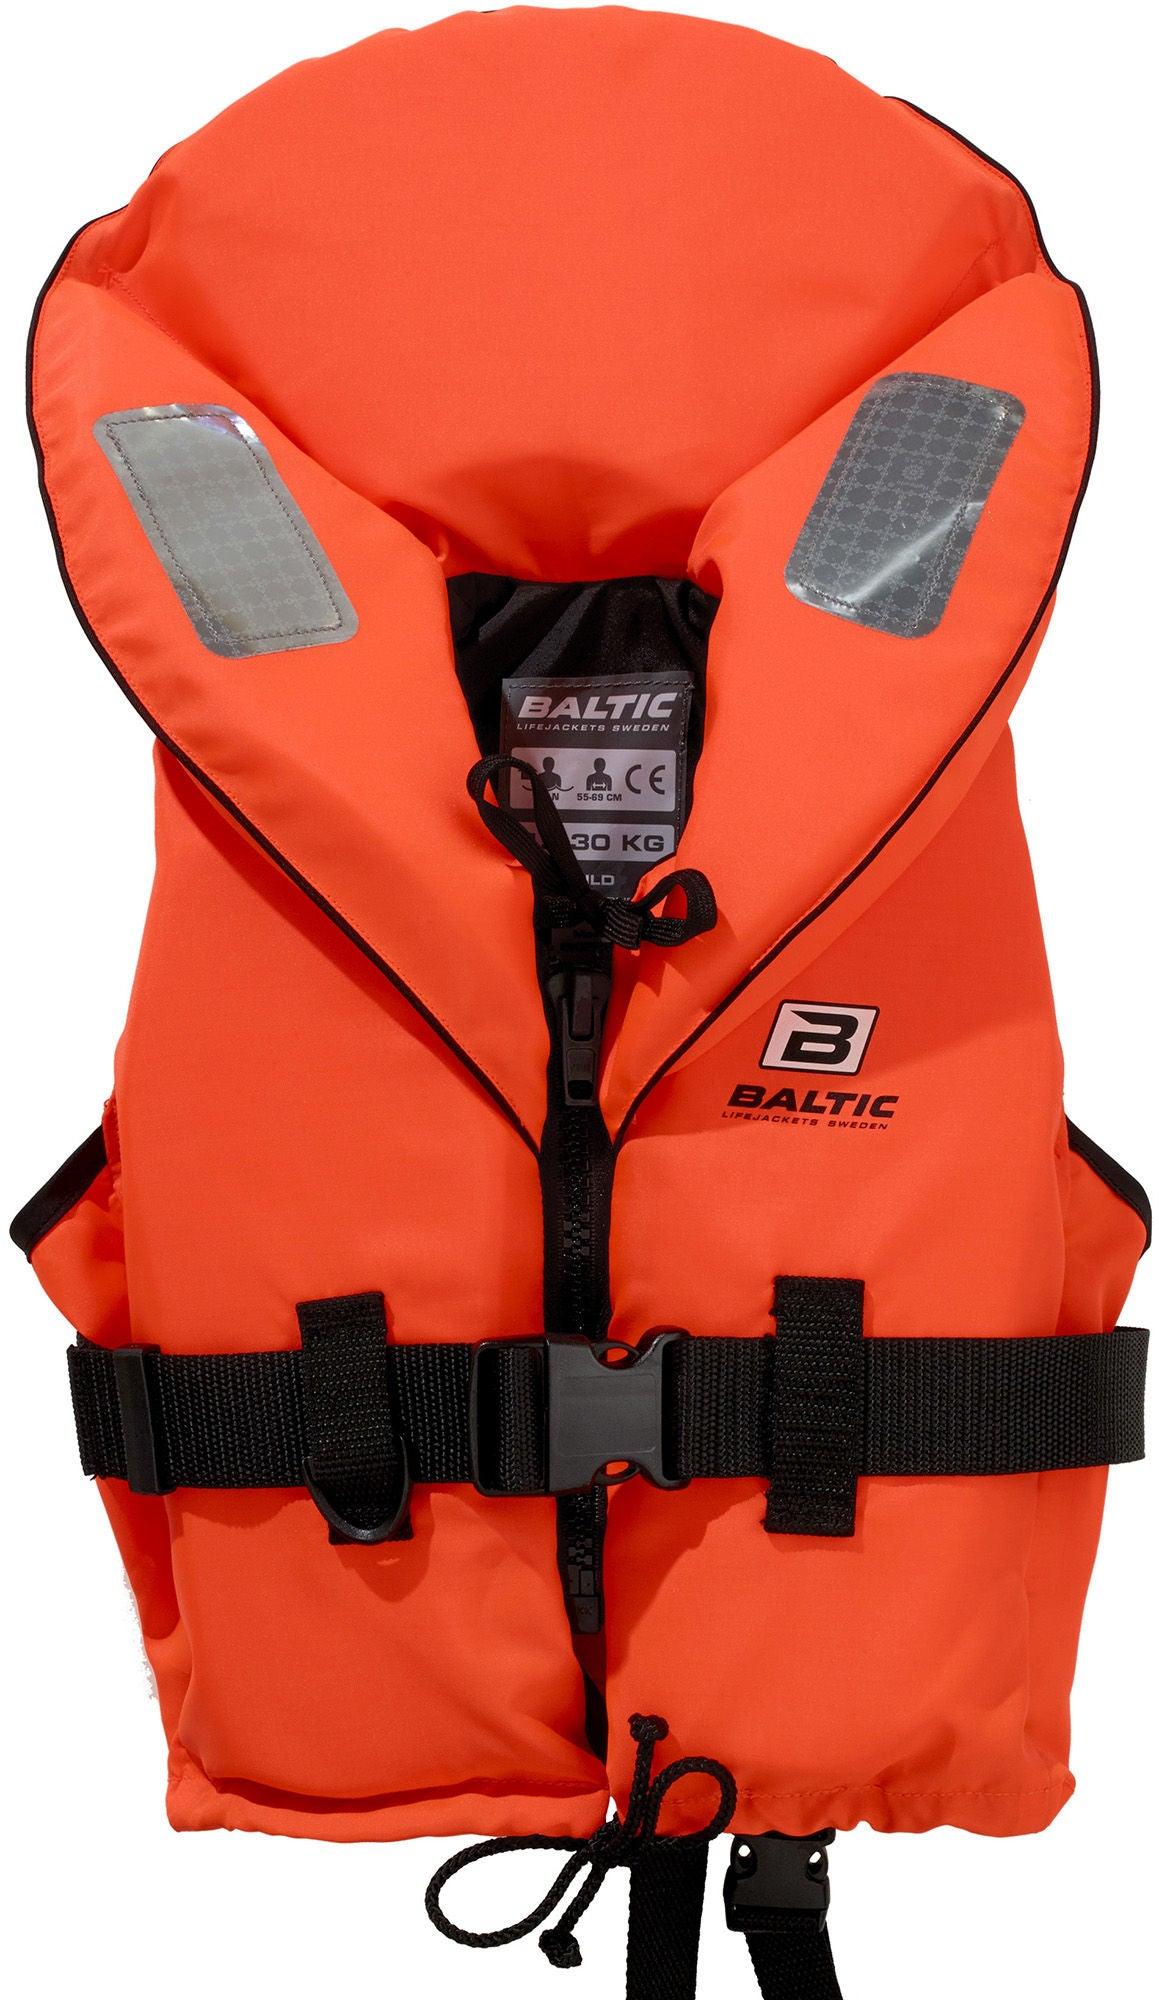 Baltic Flytväst Skipper 10-15 kg, Orange